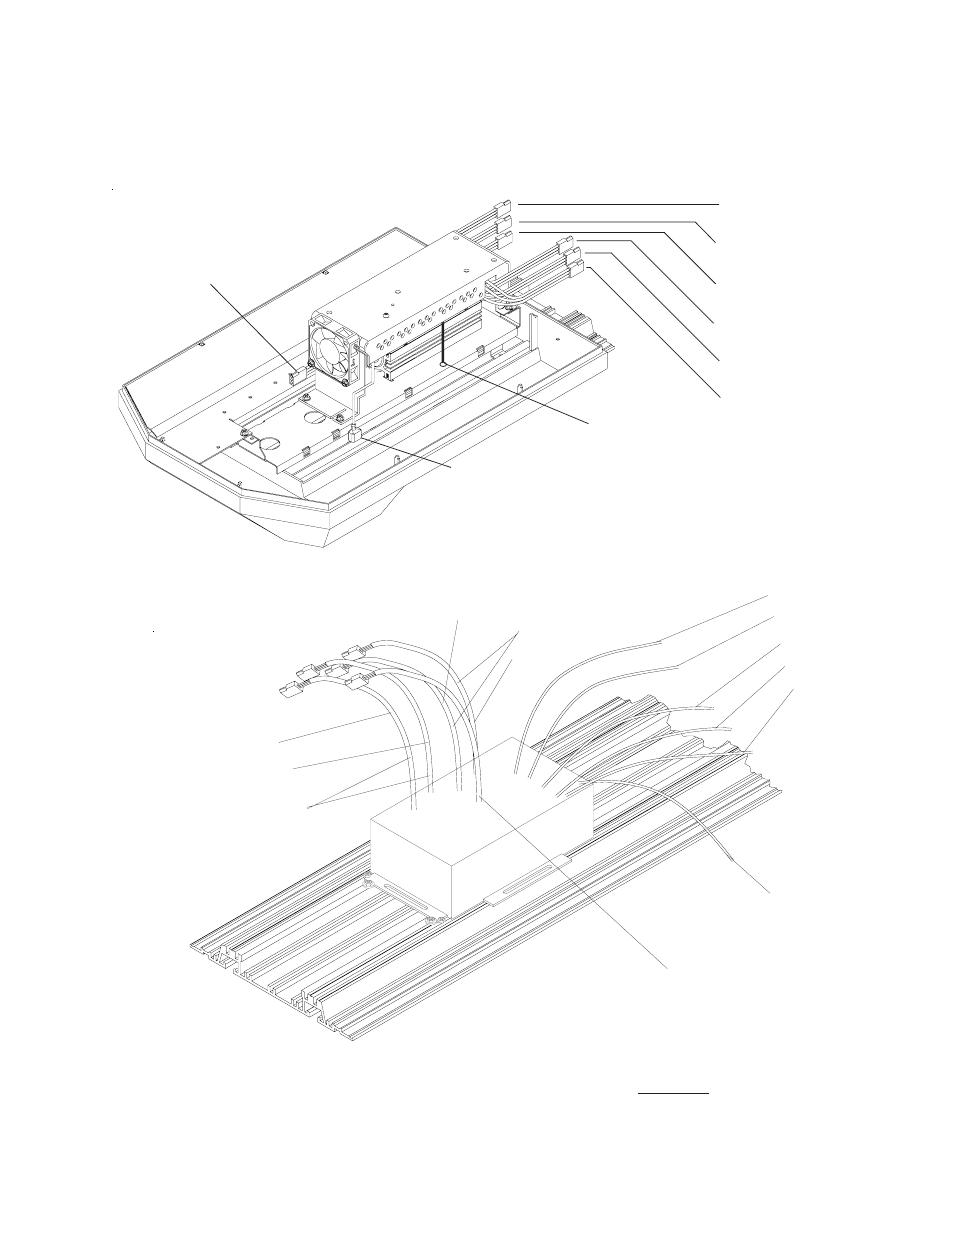 code 3 mx 7000 user manual page 18 32. Black Bedroom Furniture Sets. Home Design Ideas